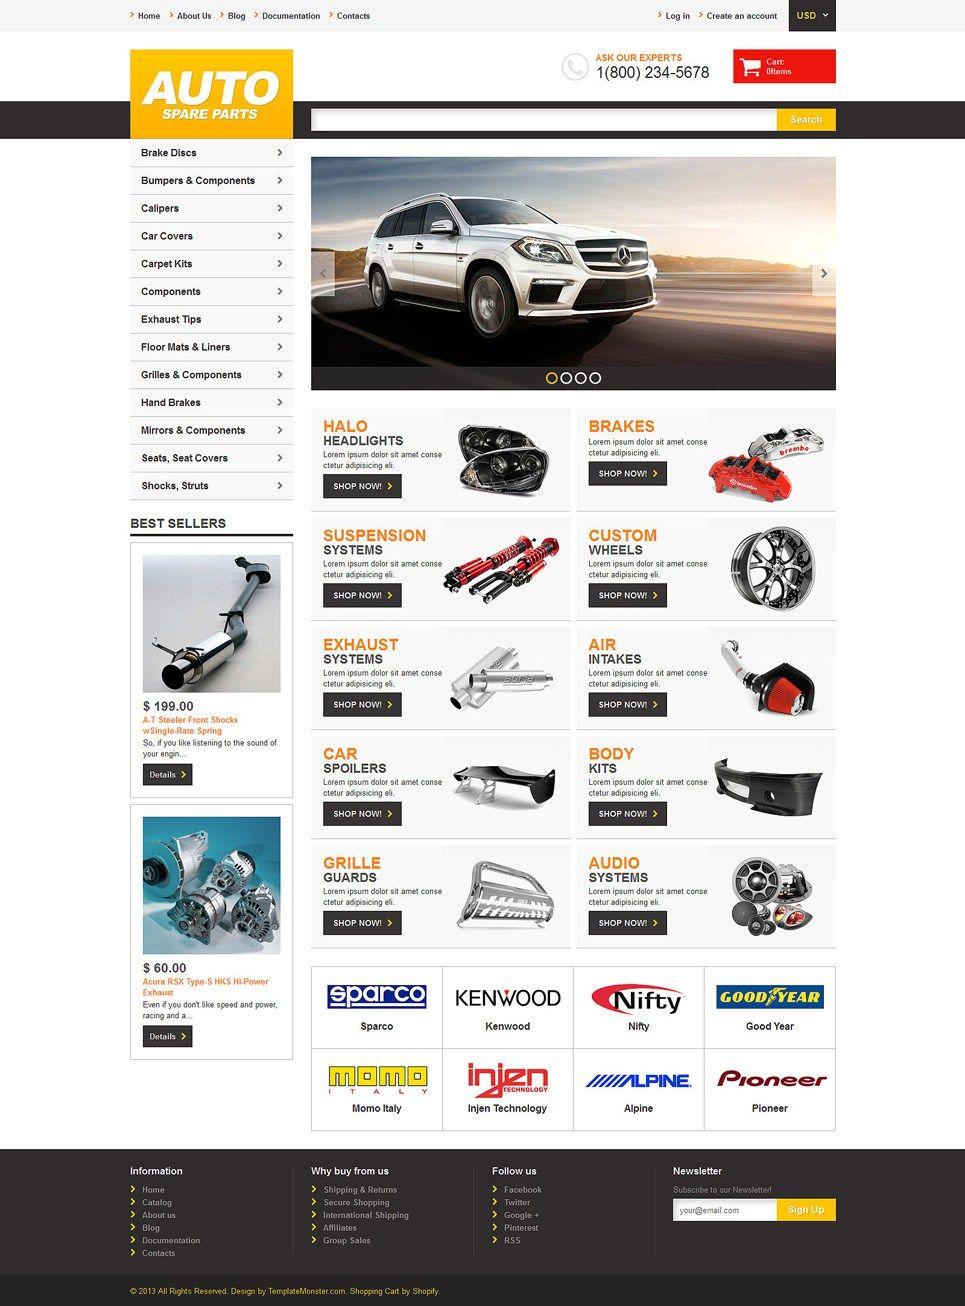 12 Best Car Automotive Shopify Ecommerce Themes Buildify Ecommerce Themes Magento Themes Shopify Theme